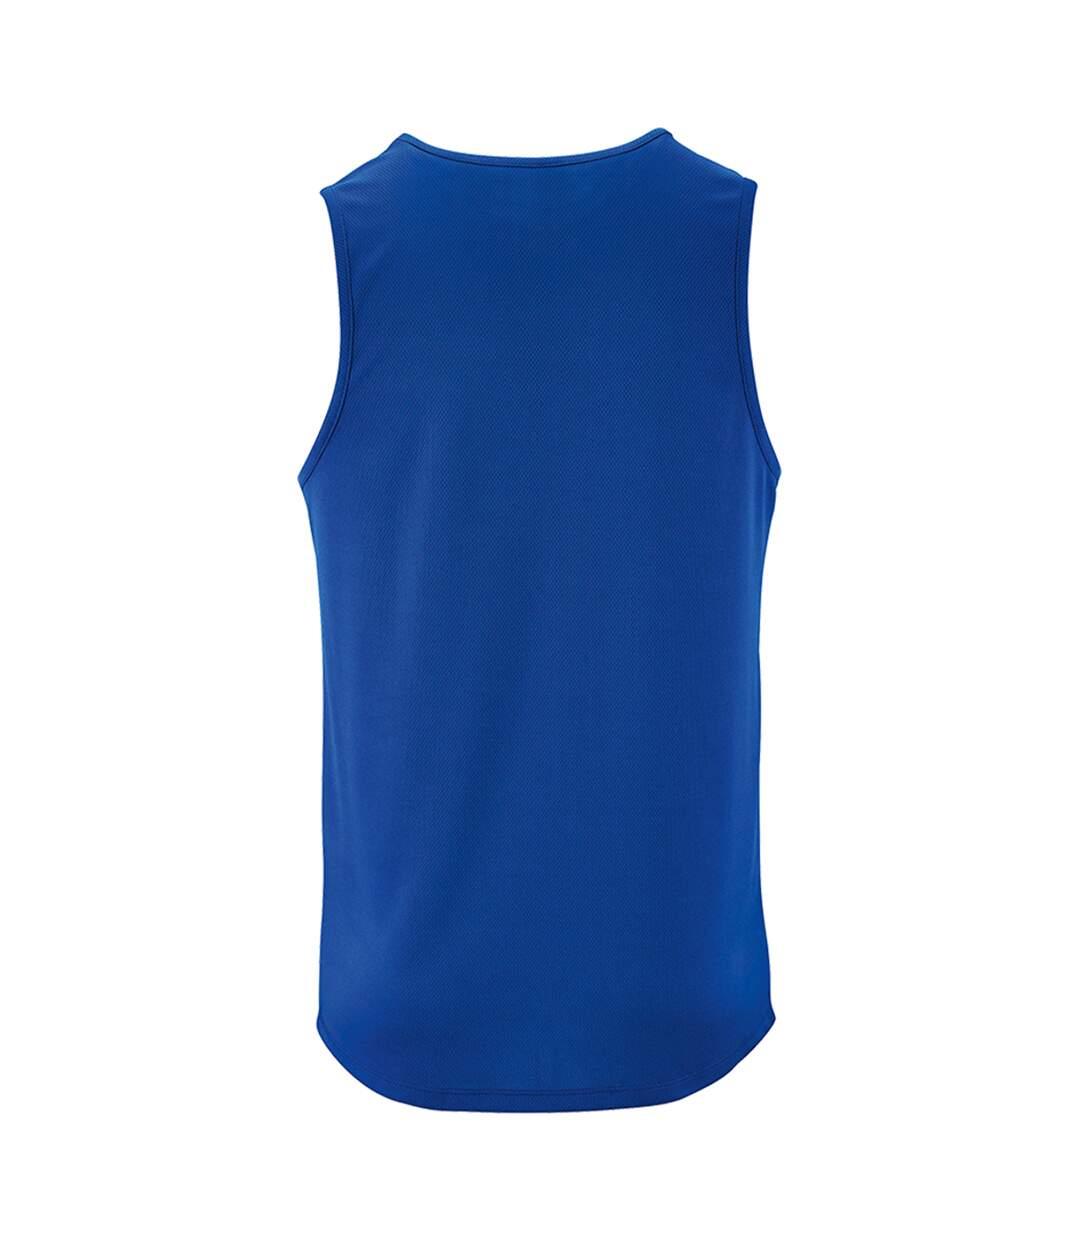 SOLS Mens Sporty Performance Tank Top (Royal Blue) - UTPC2904